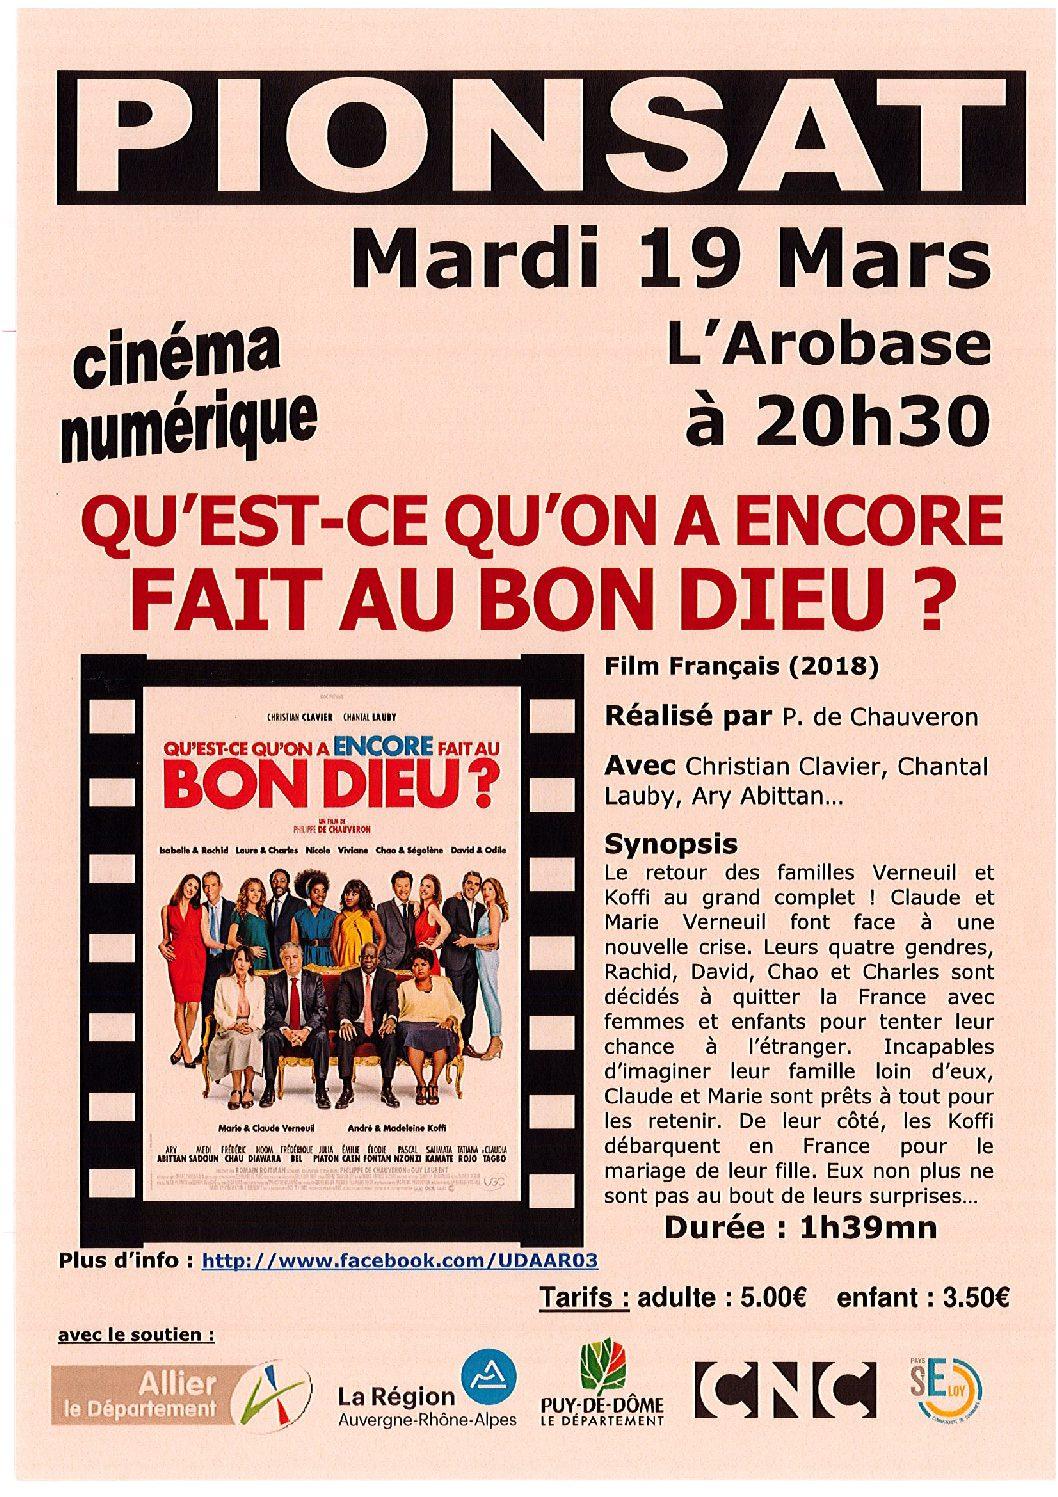 CINEMA DU 19 MARS